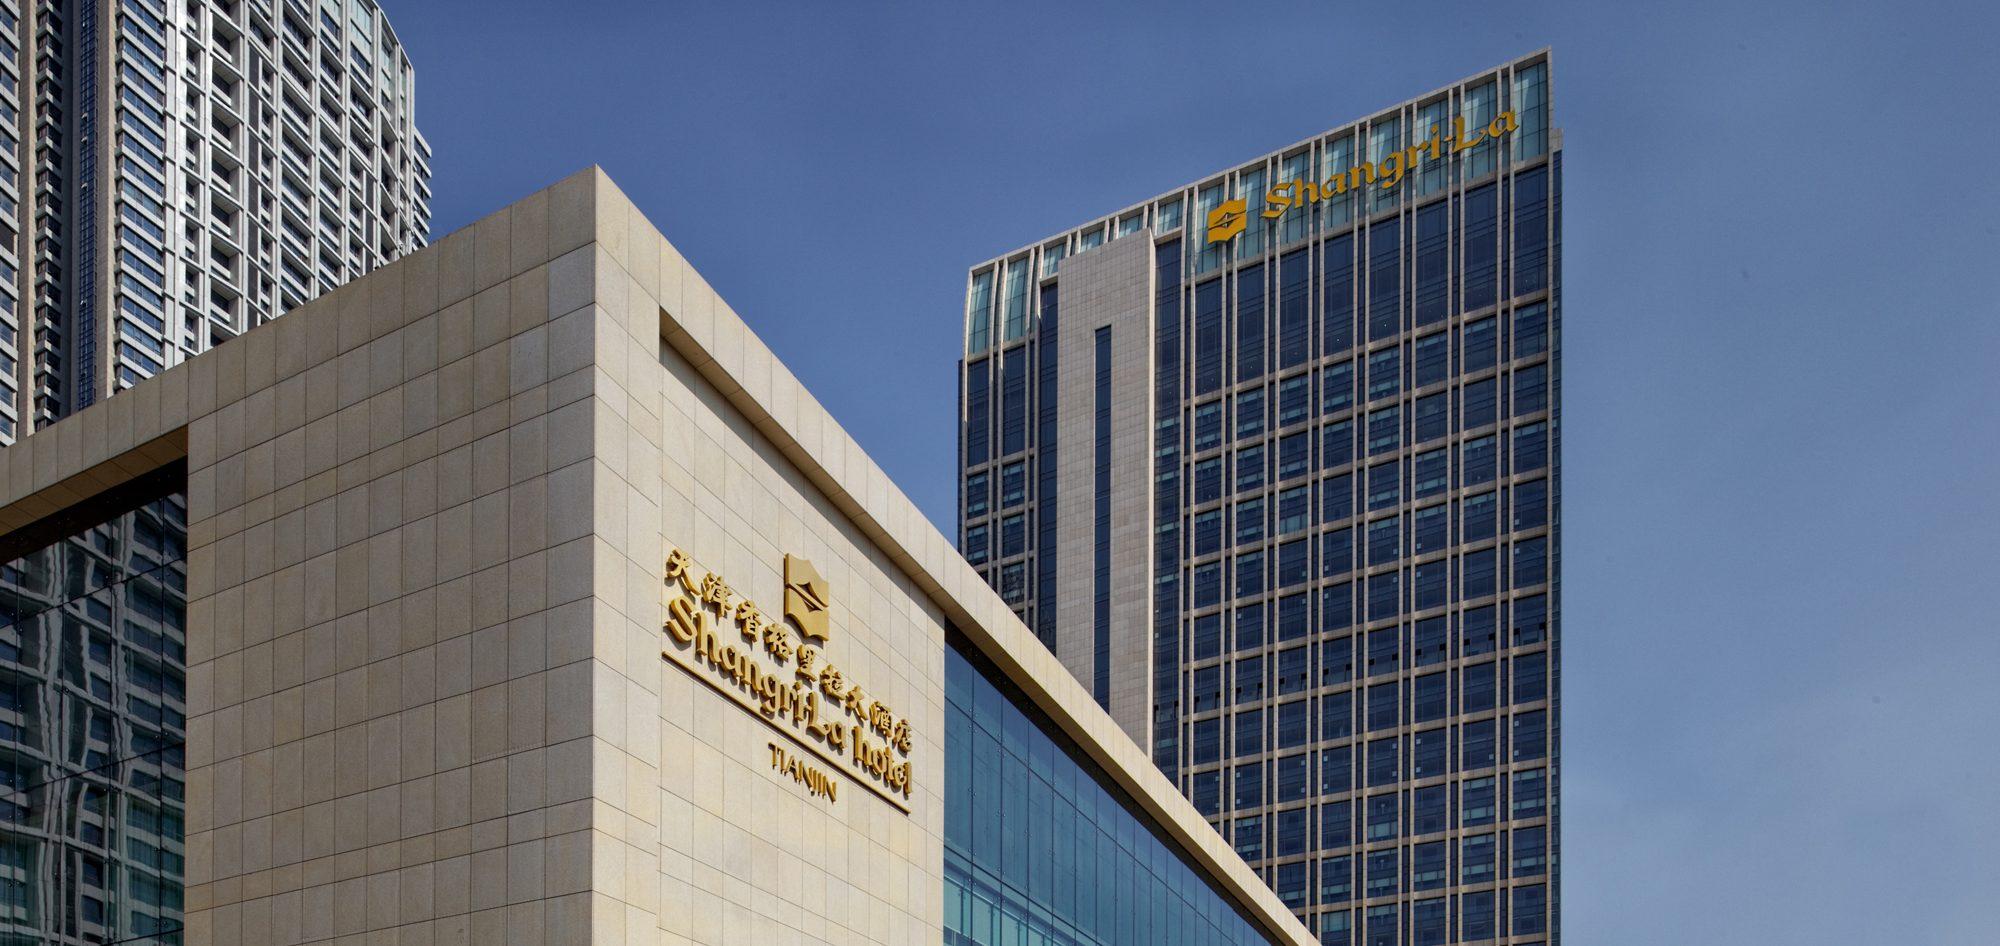 Tianjin Shangri-La Hotel